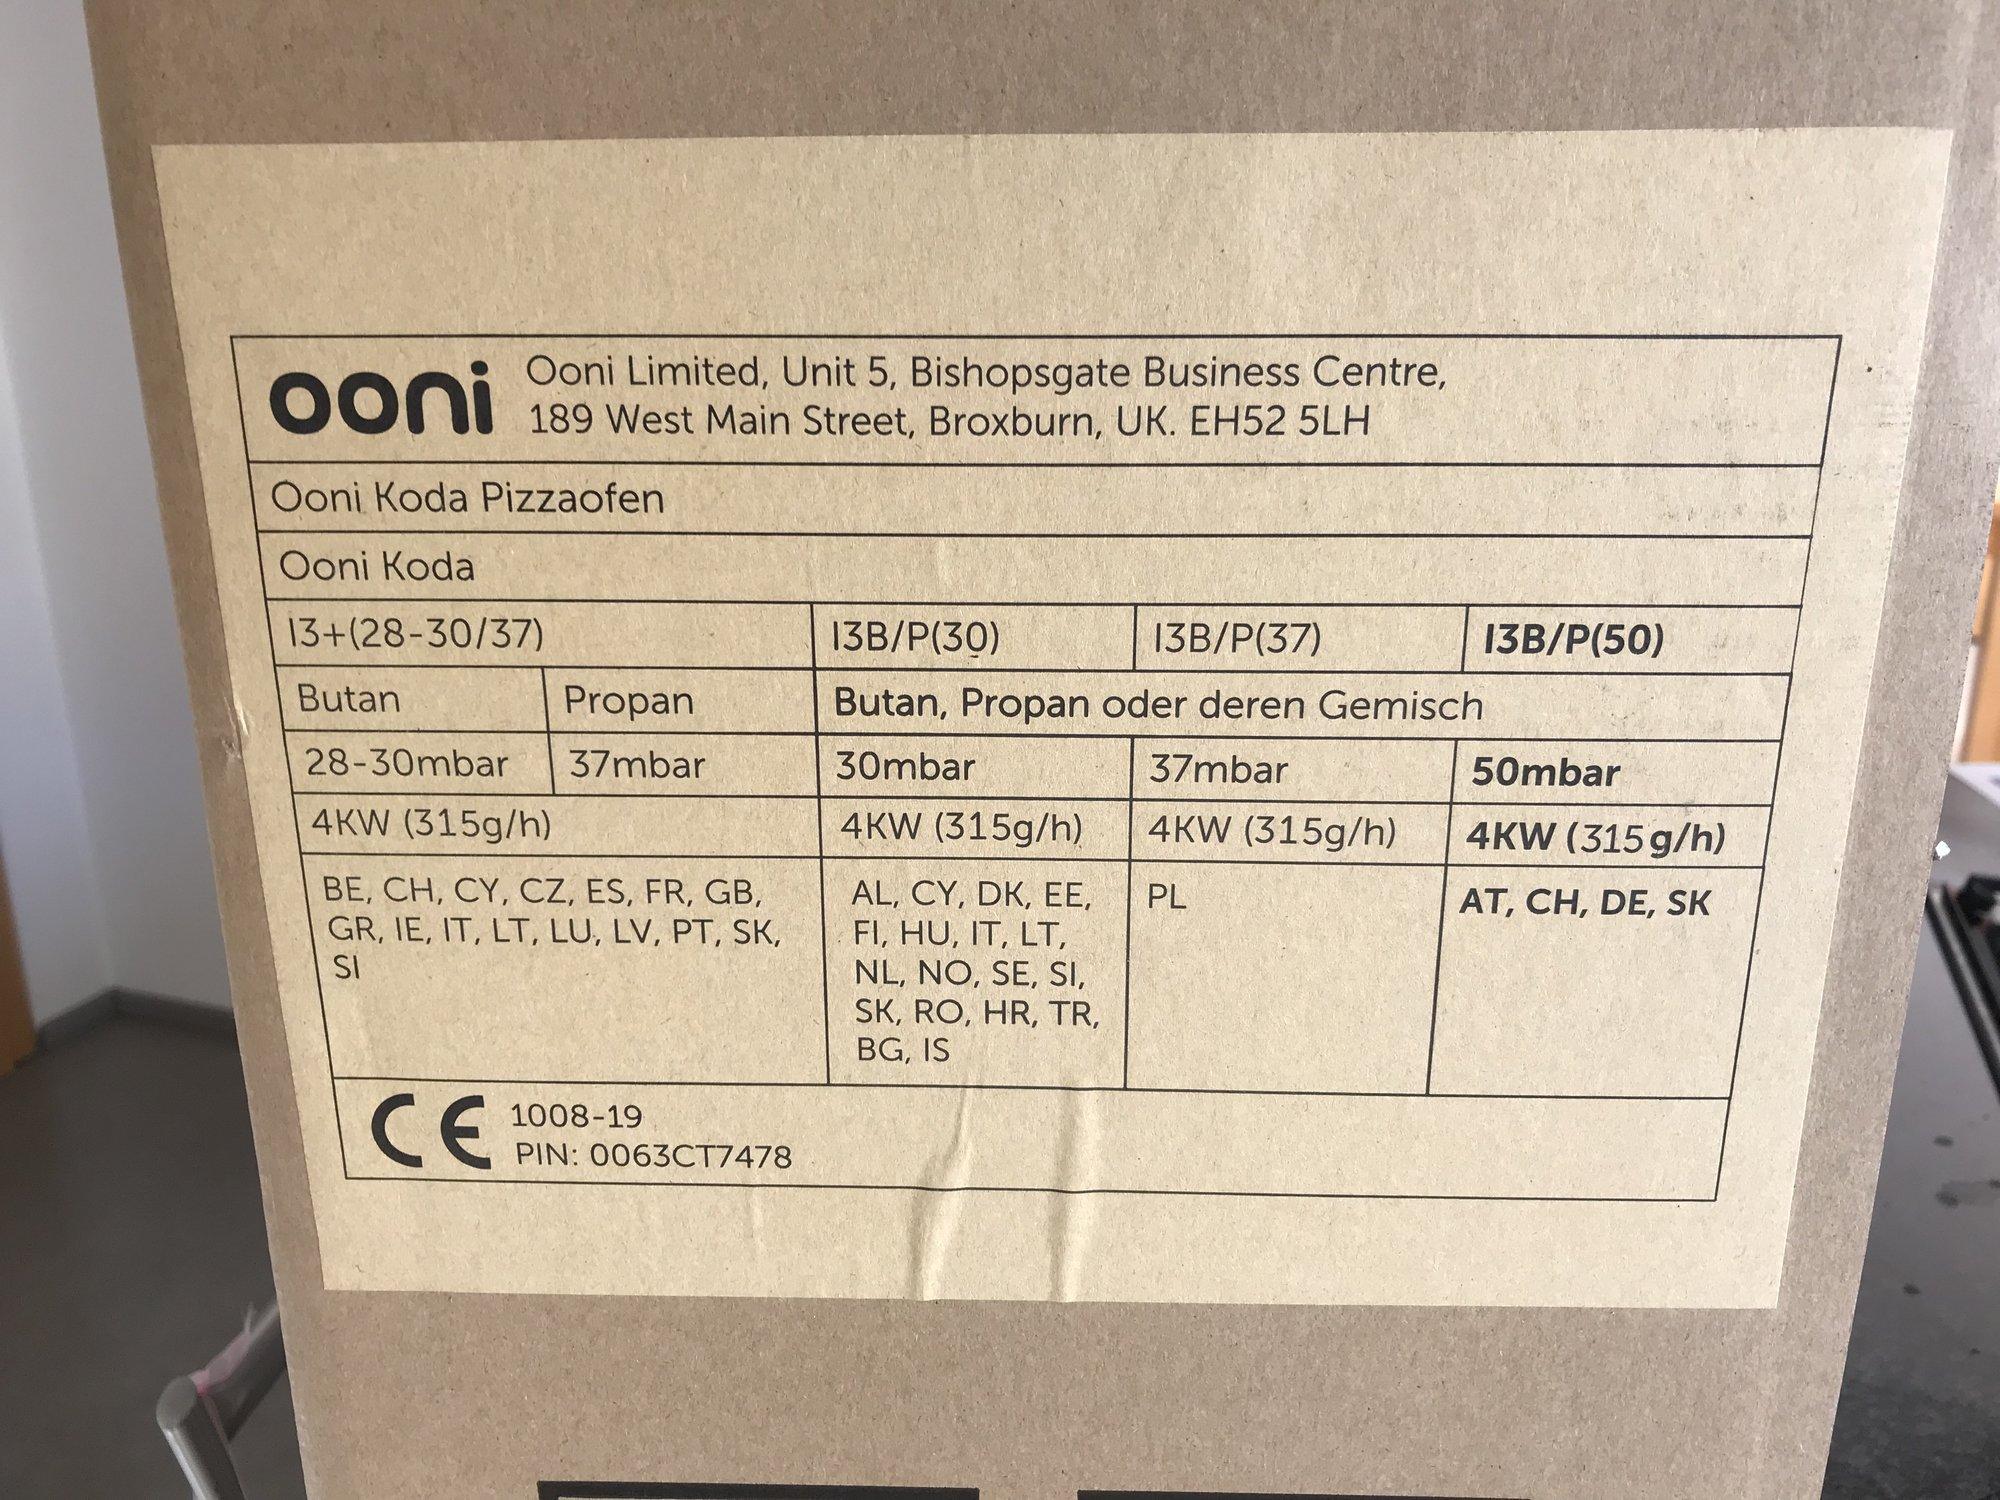 98FFDF4A-C806-45C9-A56D-C557040701AF.jpeg